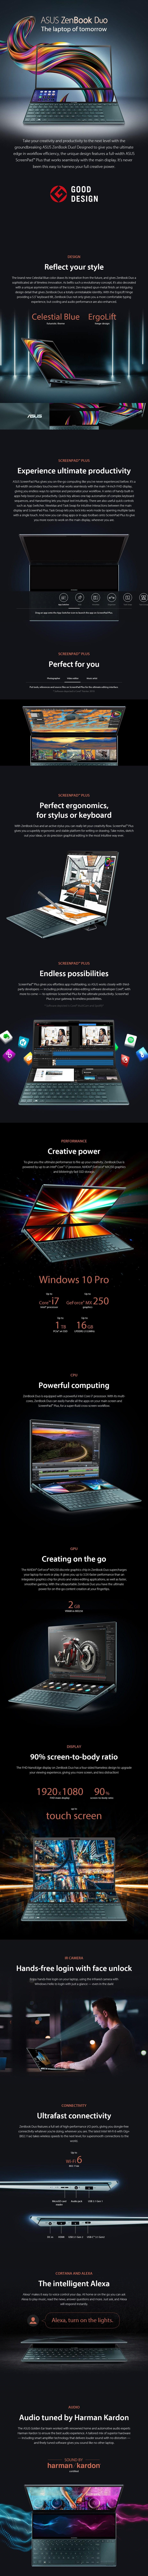 asus-zenbook-duo-ux481fl-14-laptop-i710510u-16gb-1tb-mx250-w10p-touch-ac33635-6.jpg